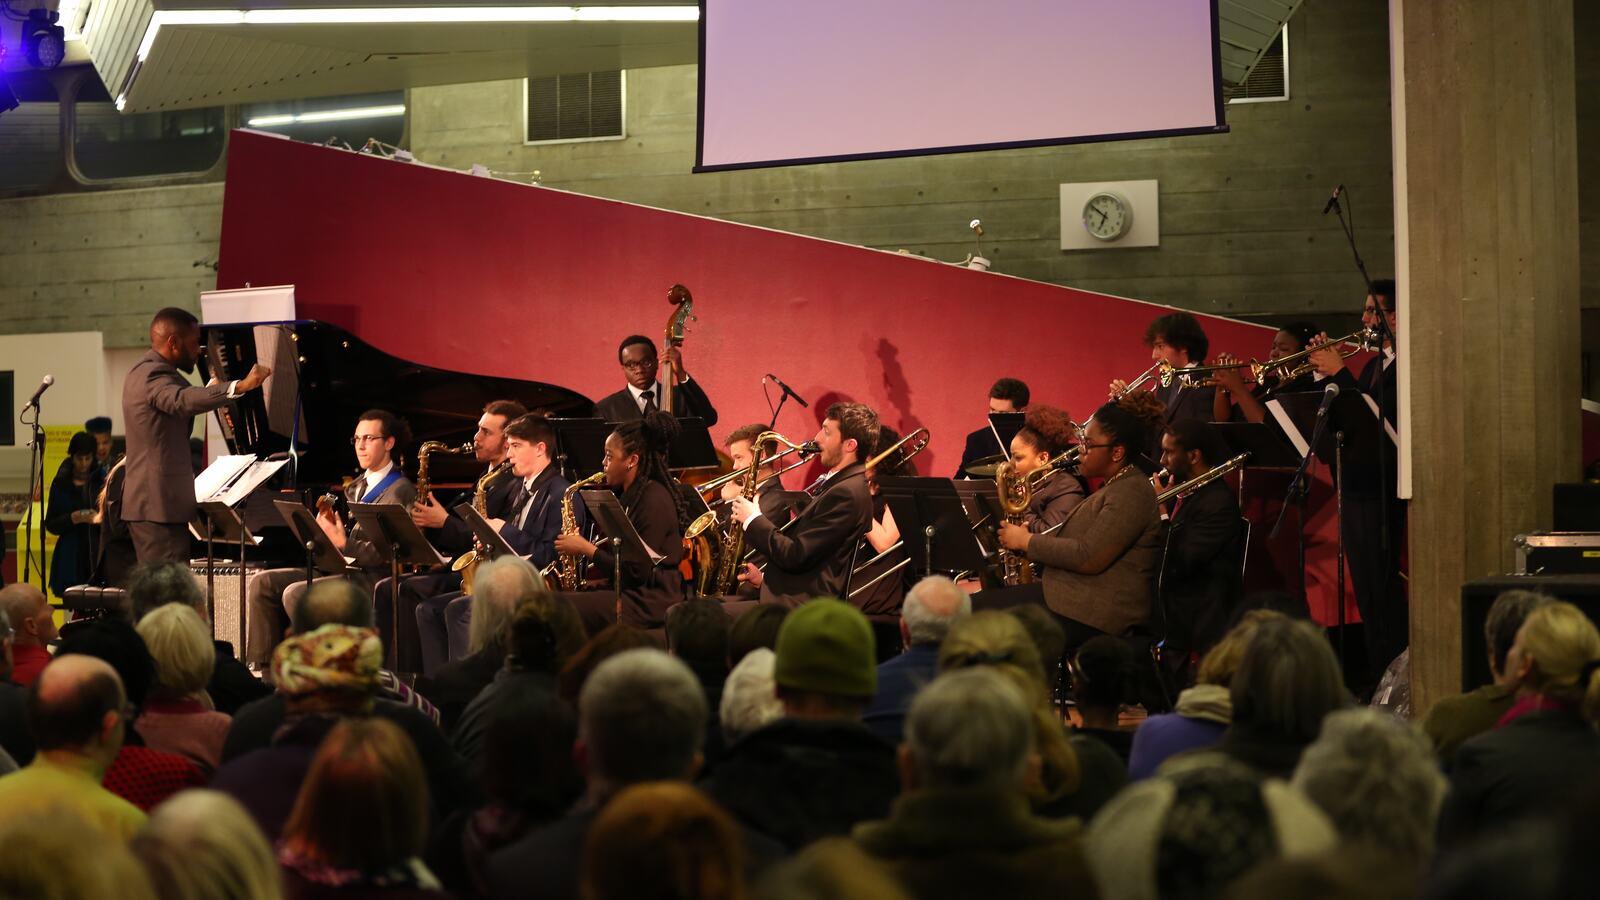 Tomorrow's Warriors Soon Come Orchestra in Queen Elizabeth Hall